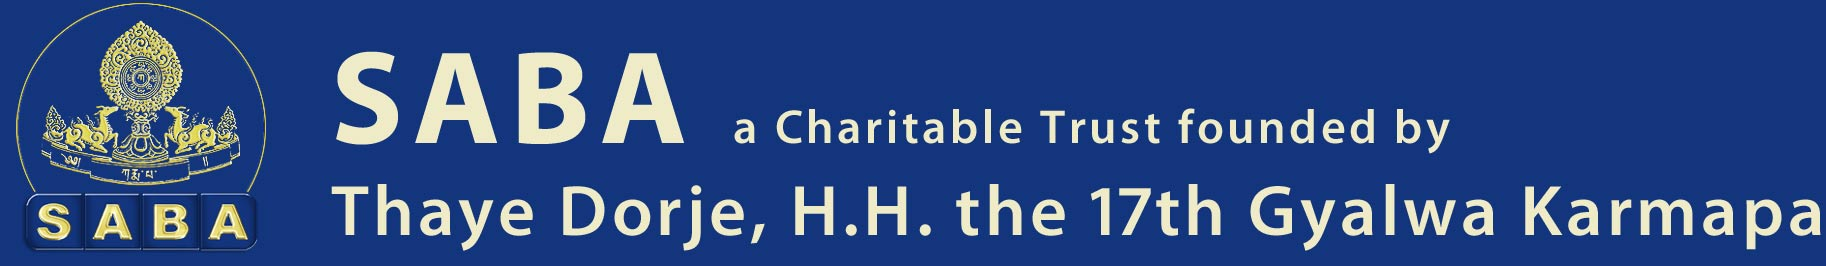 SABA, a Charitable Trust founded by Thaye Dorje, H.H. the 17th Gyalwa Karmapa, South Asia Buddhist Association